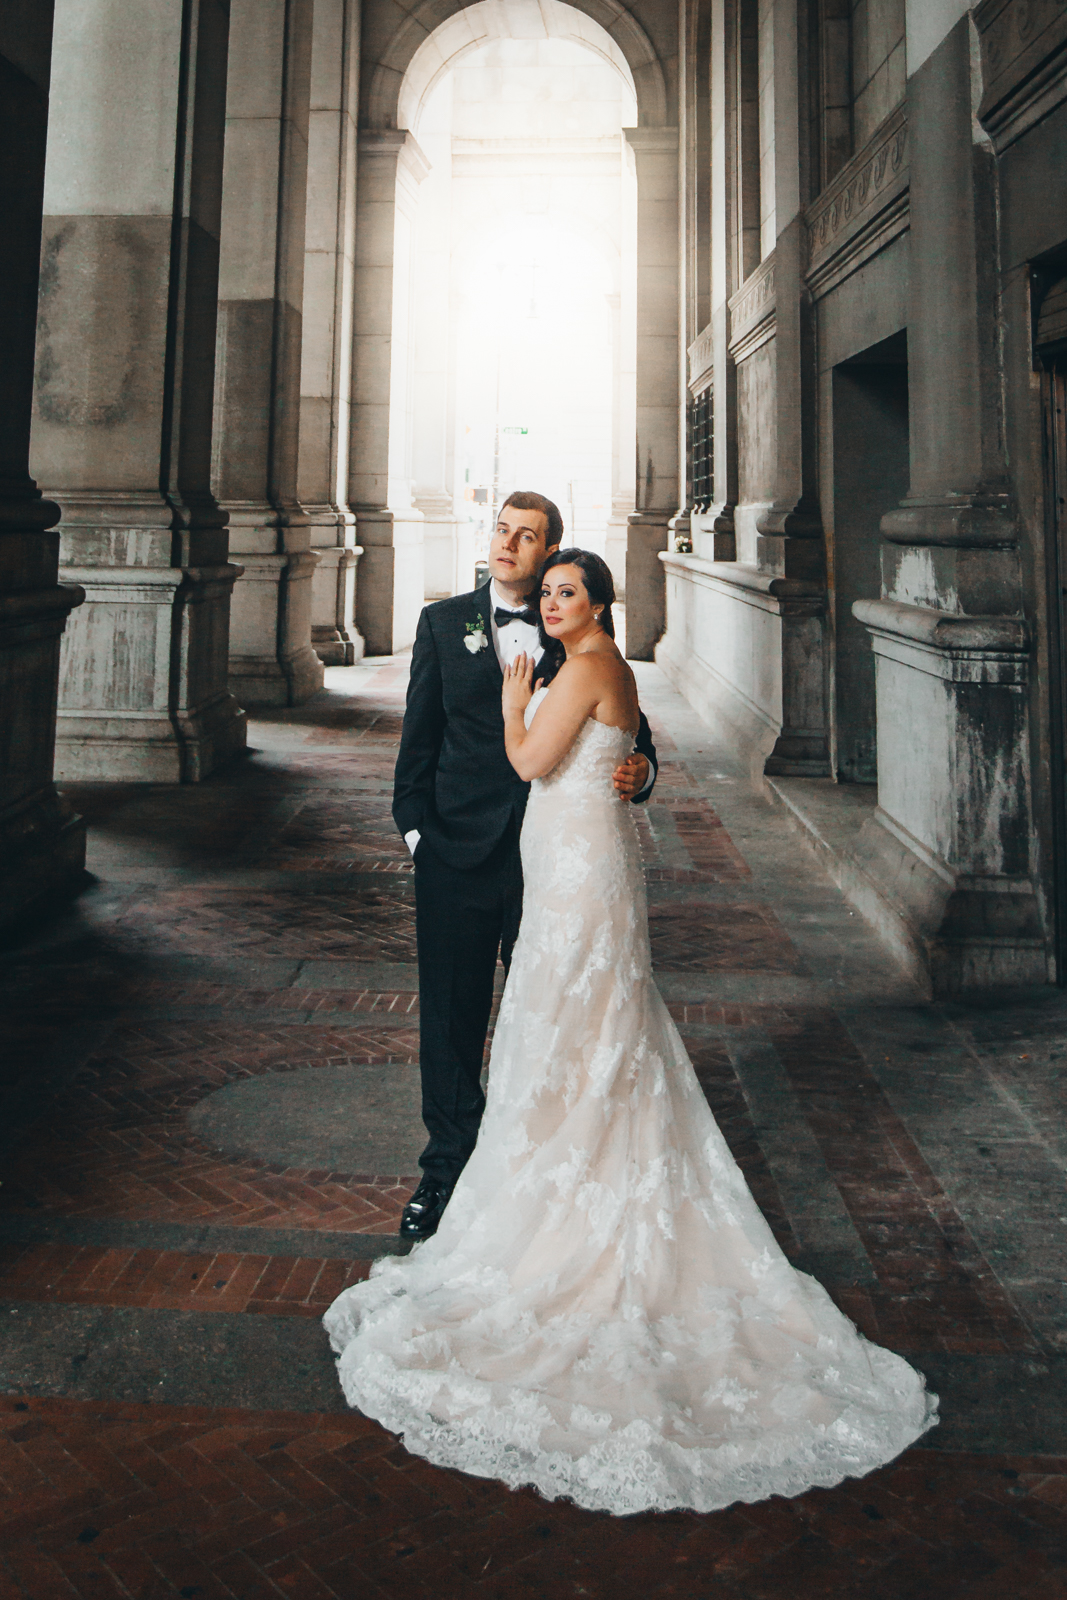 NYC Wedding Photography Lofts at Prince Brooklyn NYC Photographer Boris Zaretsky _B2C7903-Edit.jpg